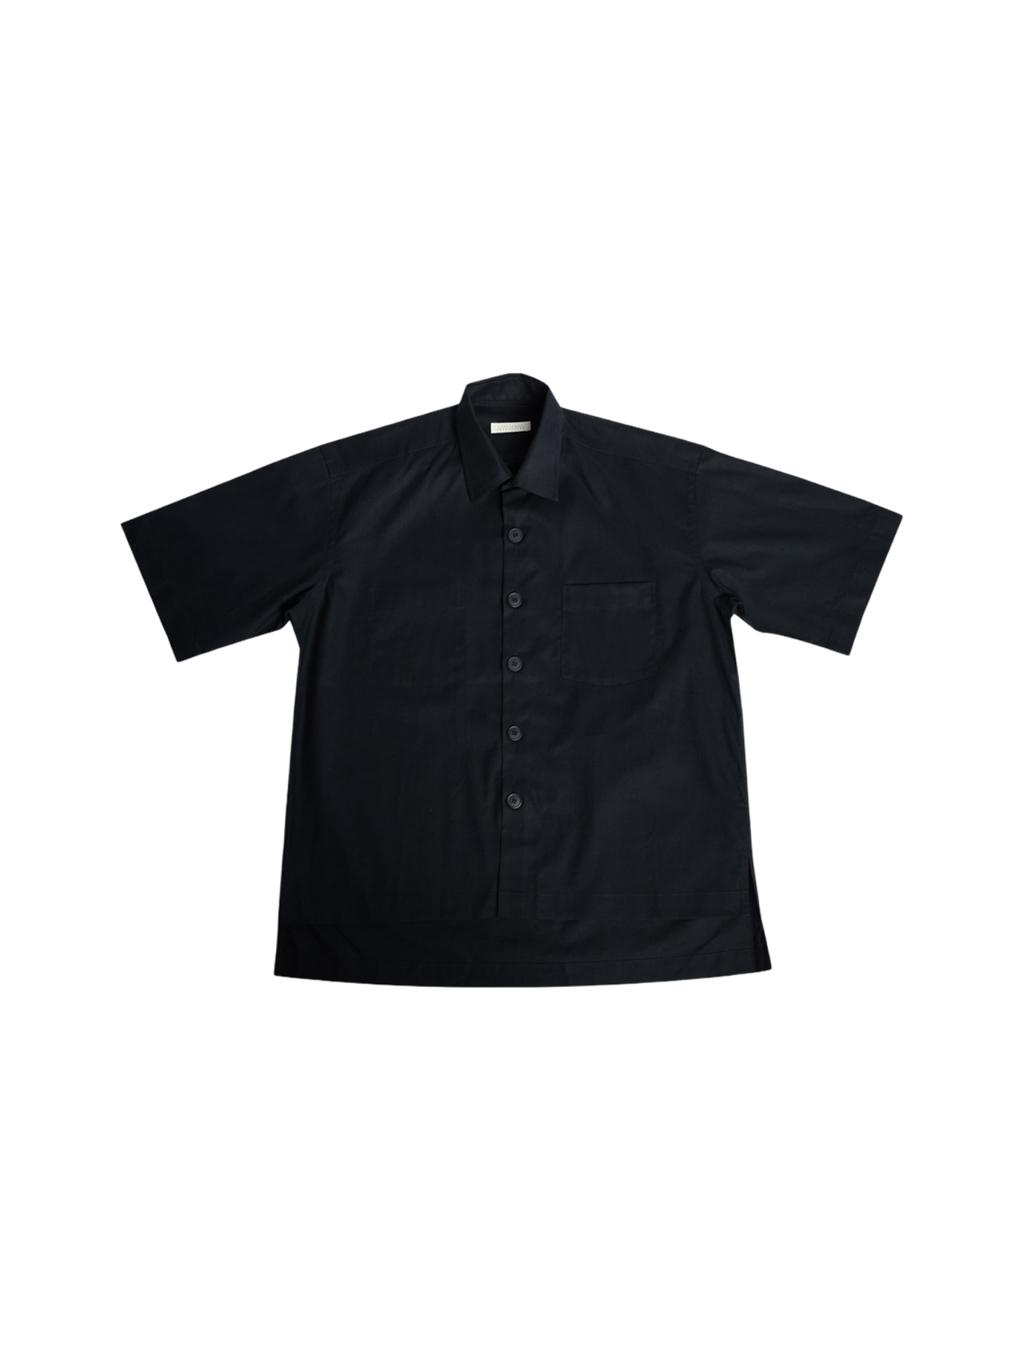 Wright Flyer Overshirt (matte black)